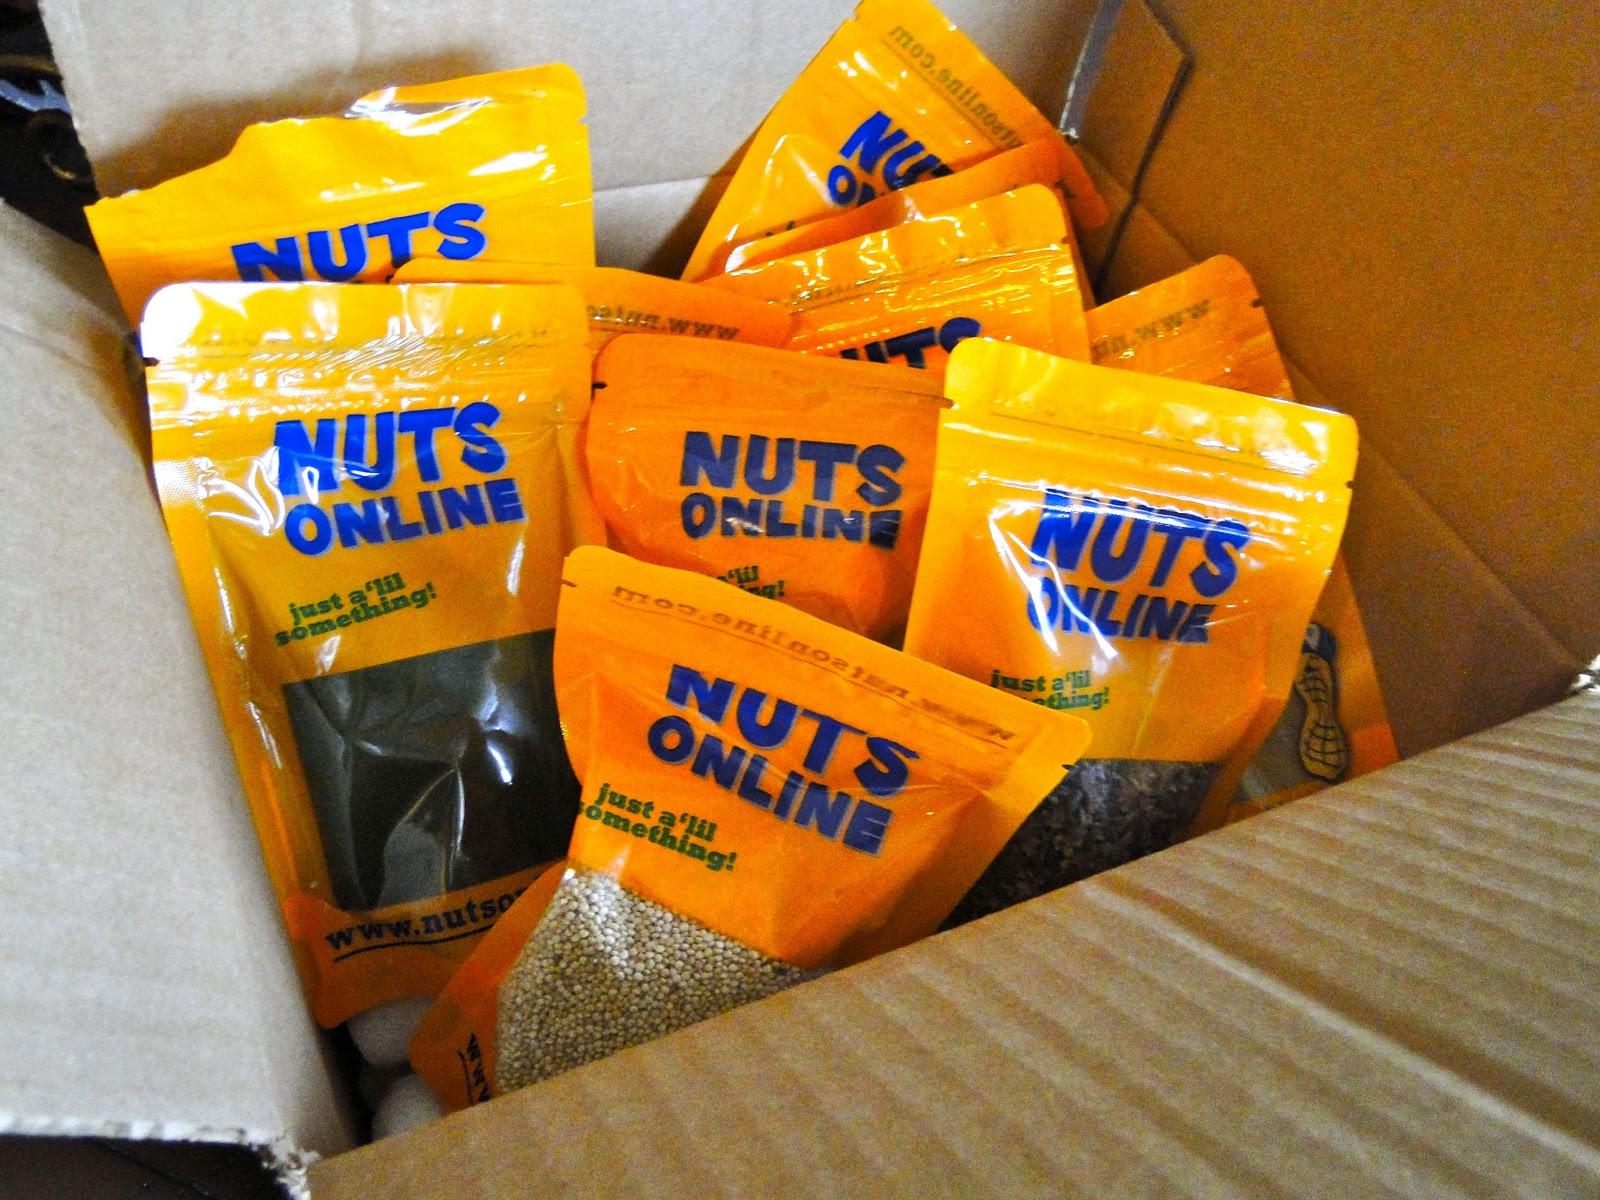 Nuts online